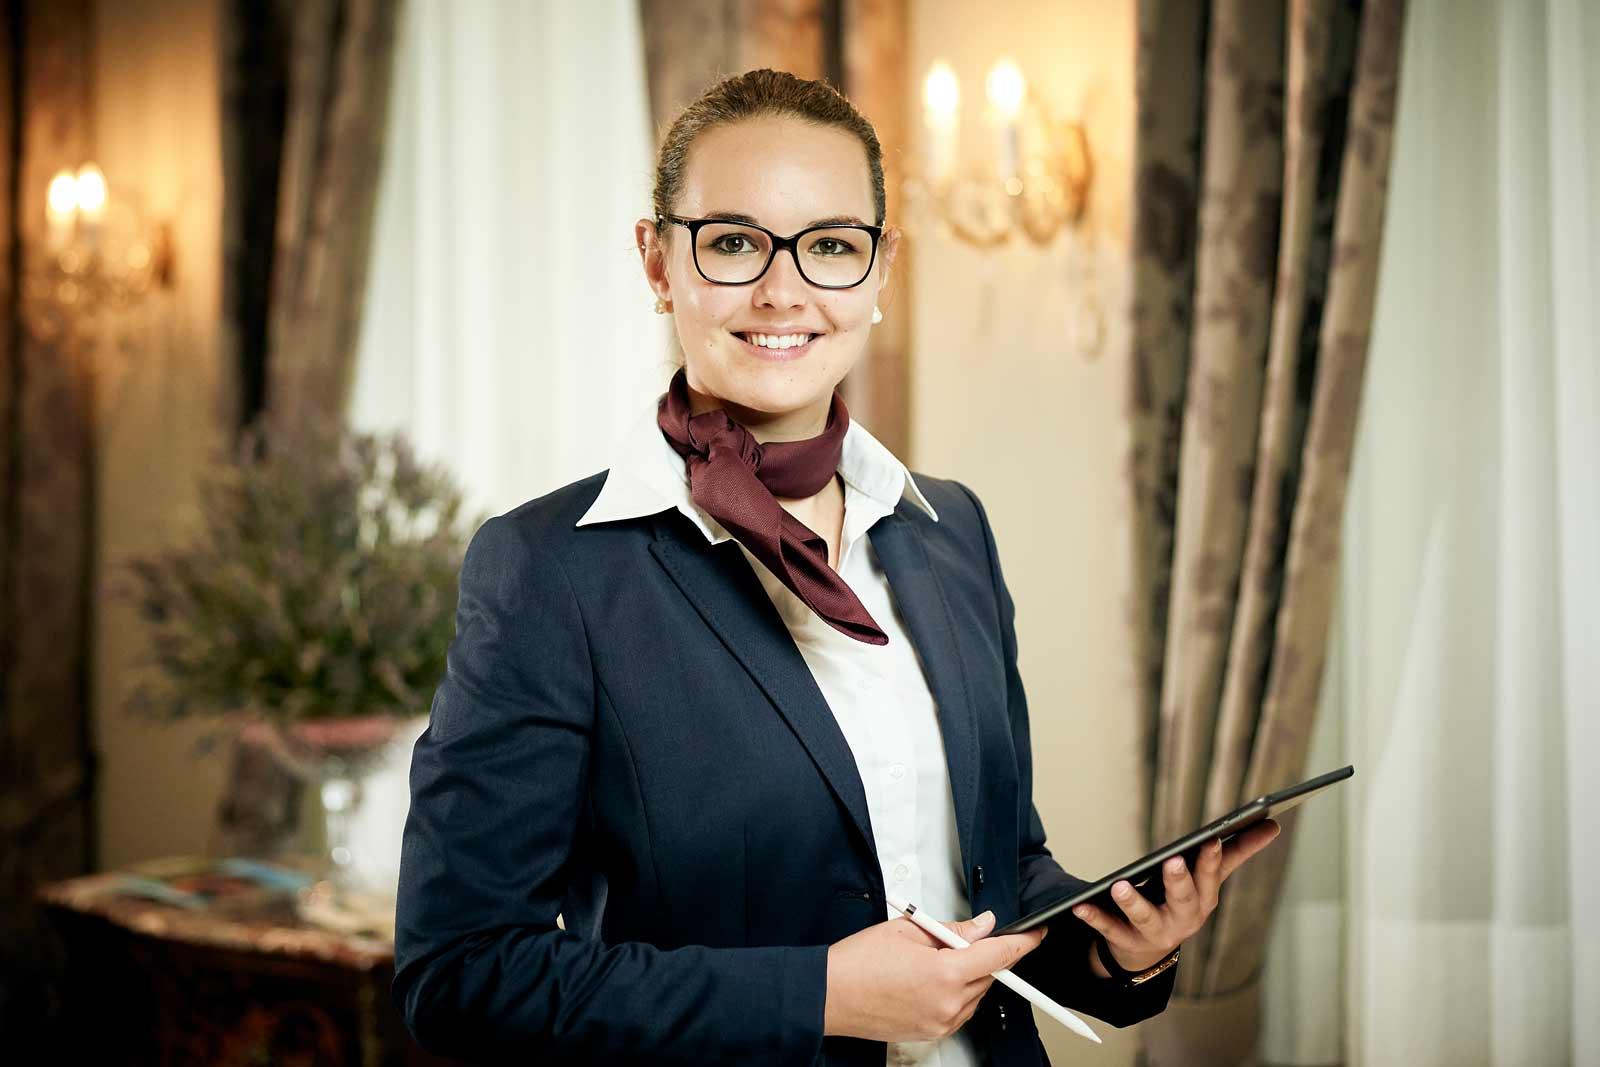 Lisa Lauener Chef de Reception